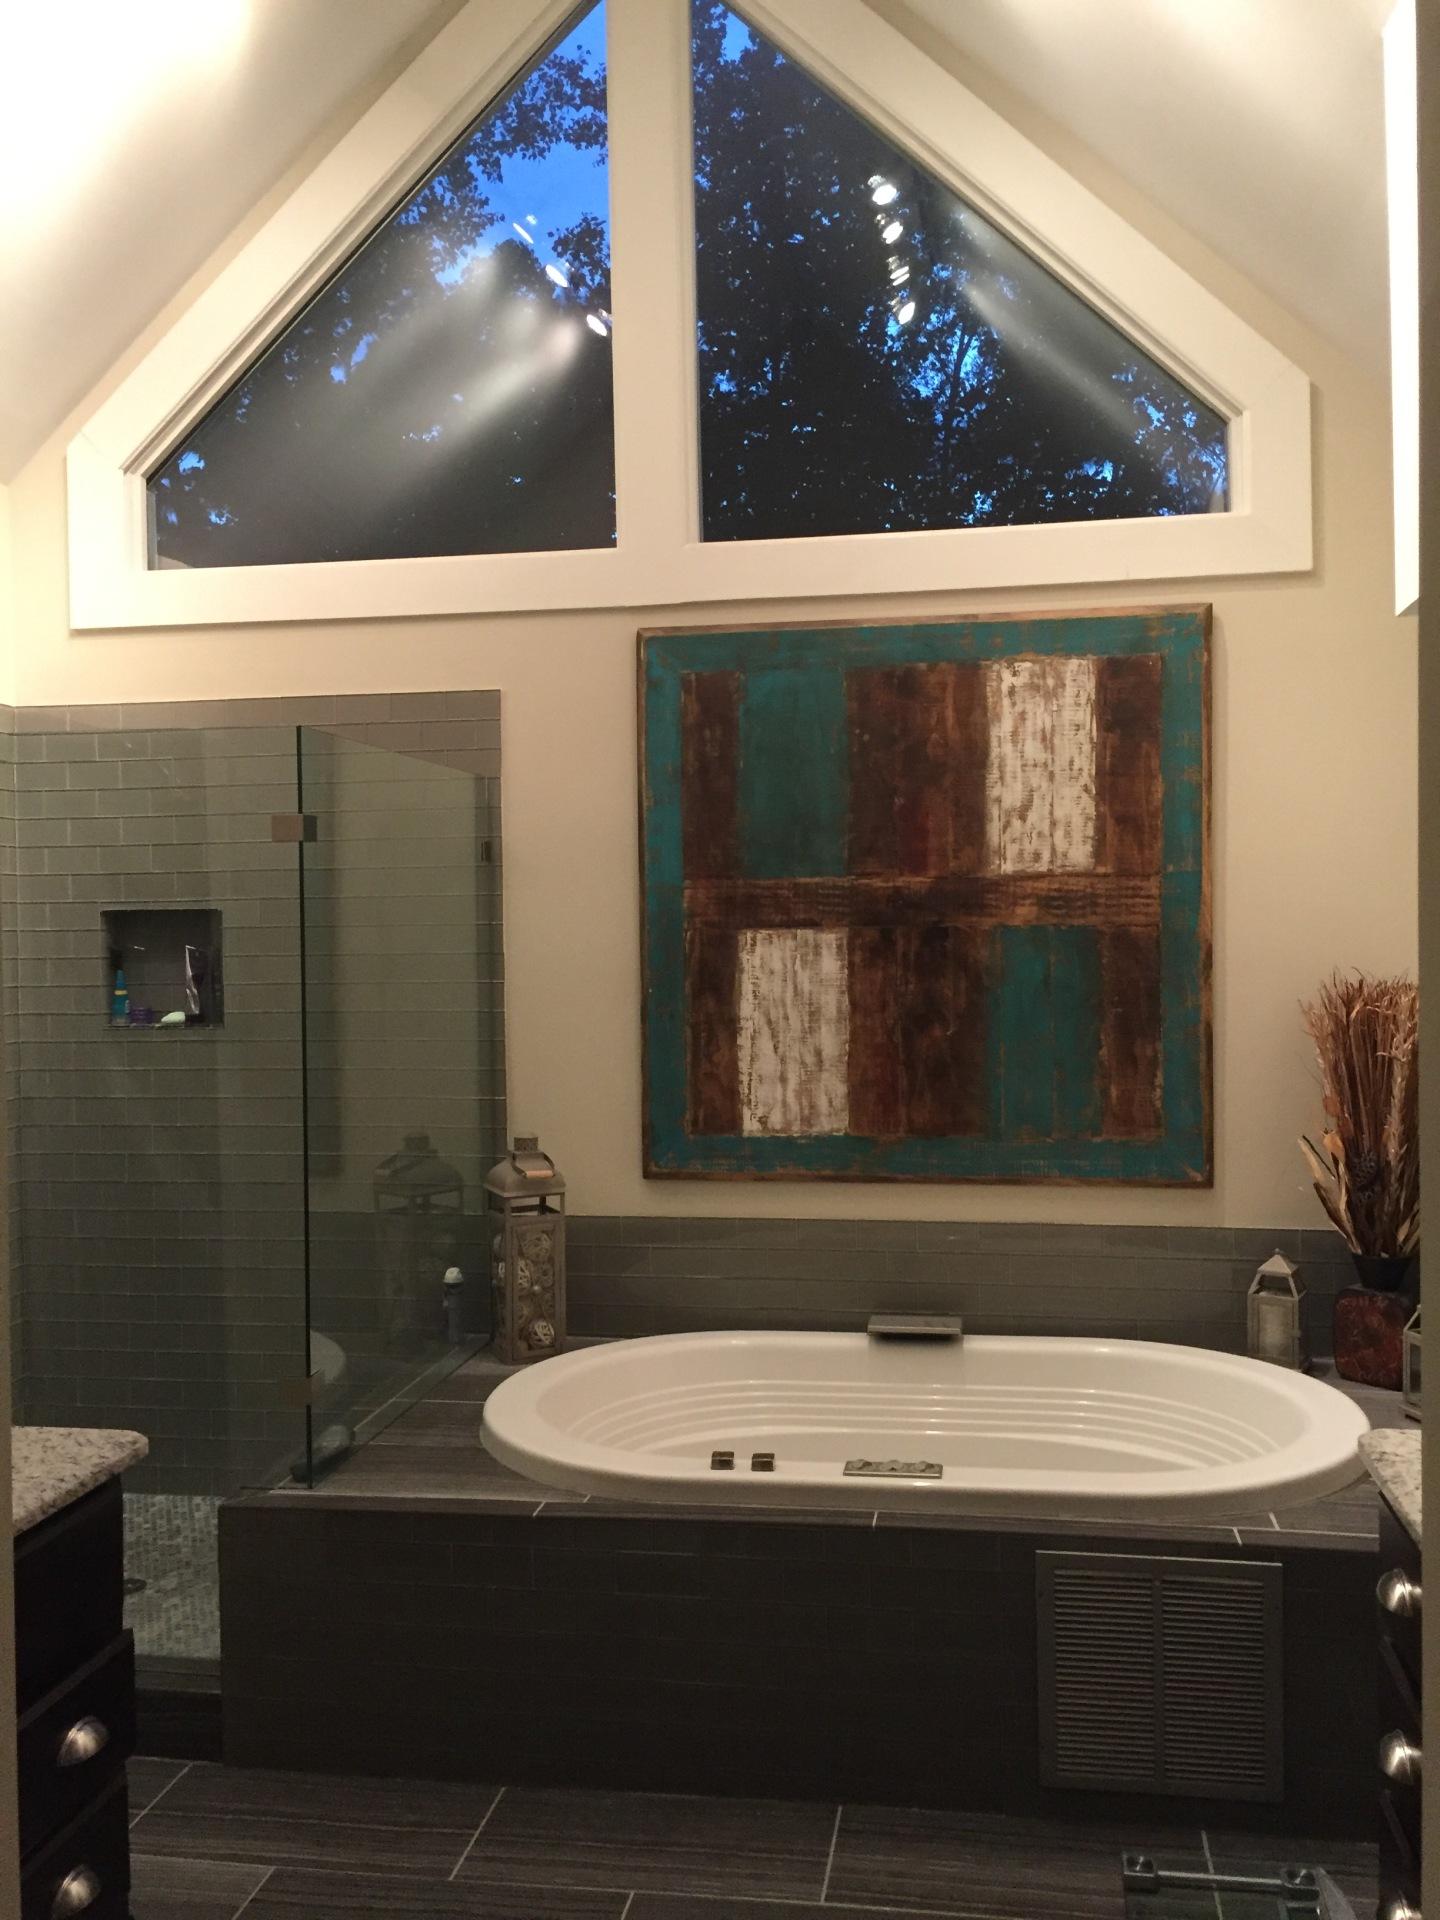 tub, whirlpool, jets, bathrooms, cabinets